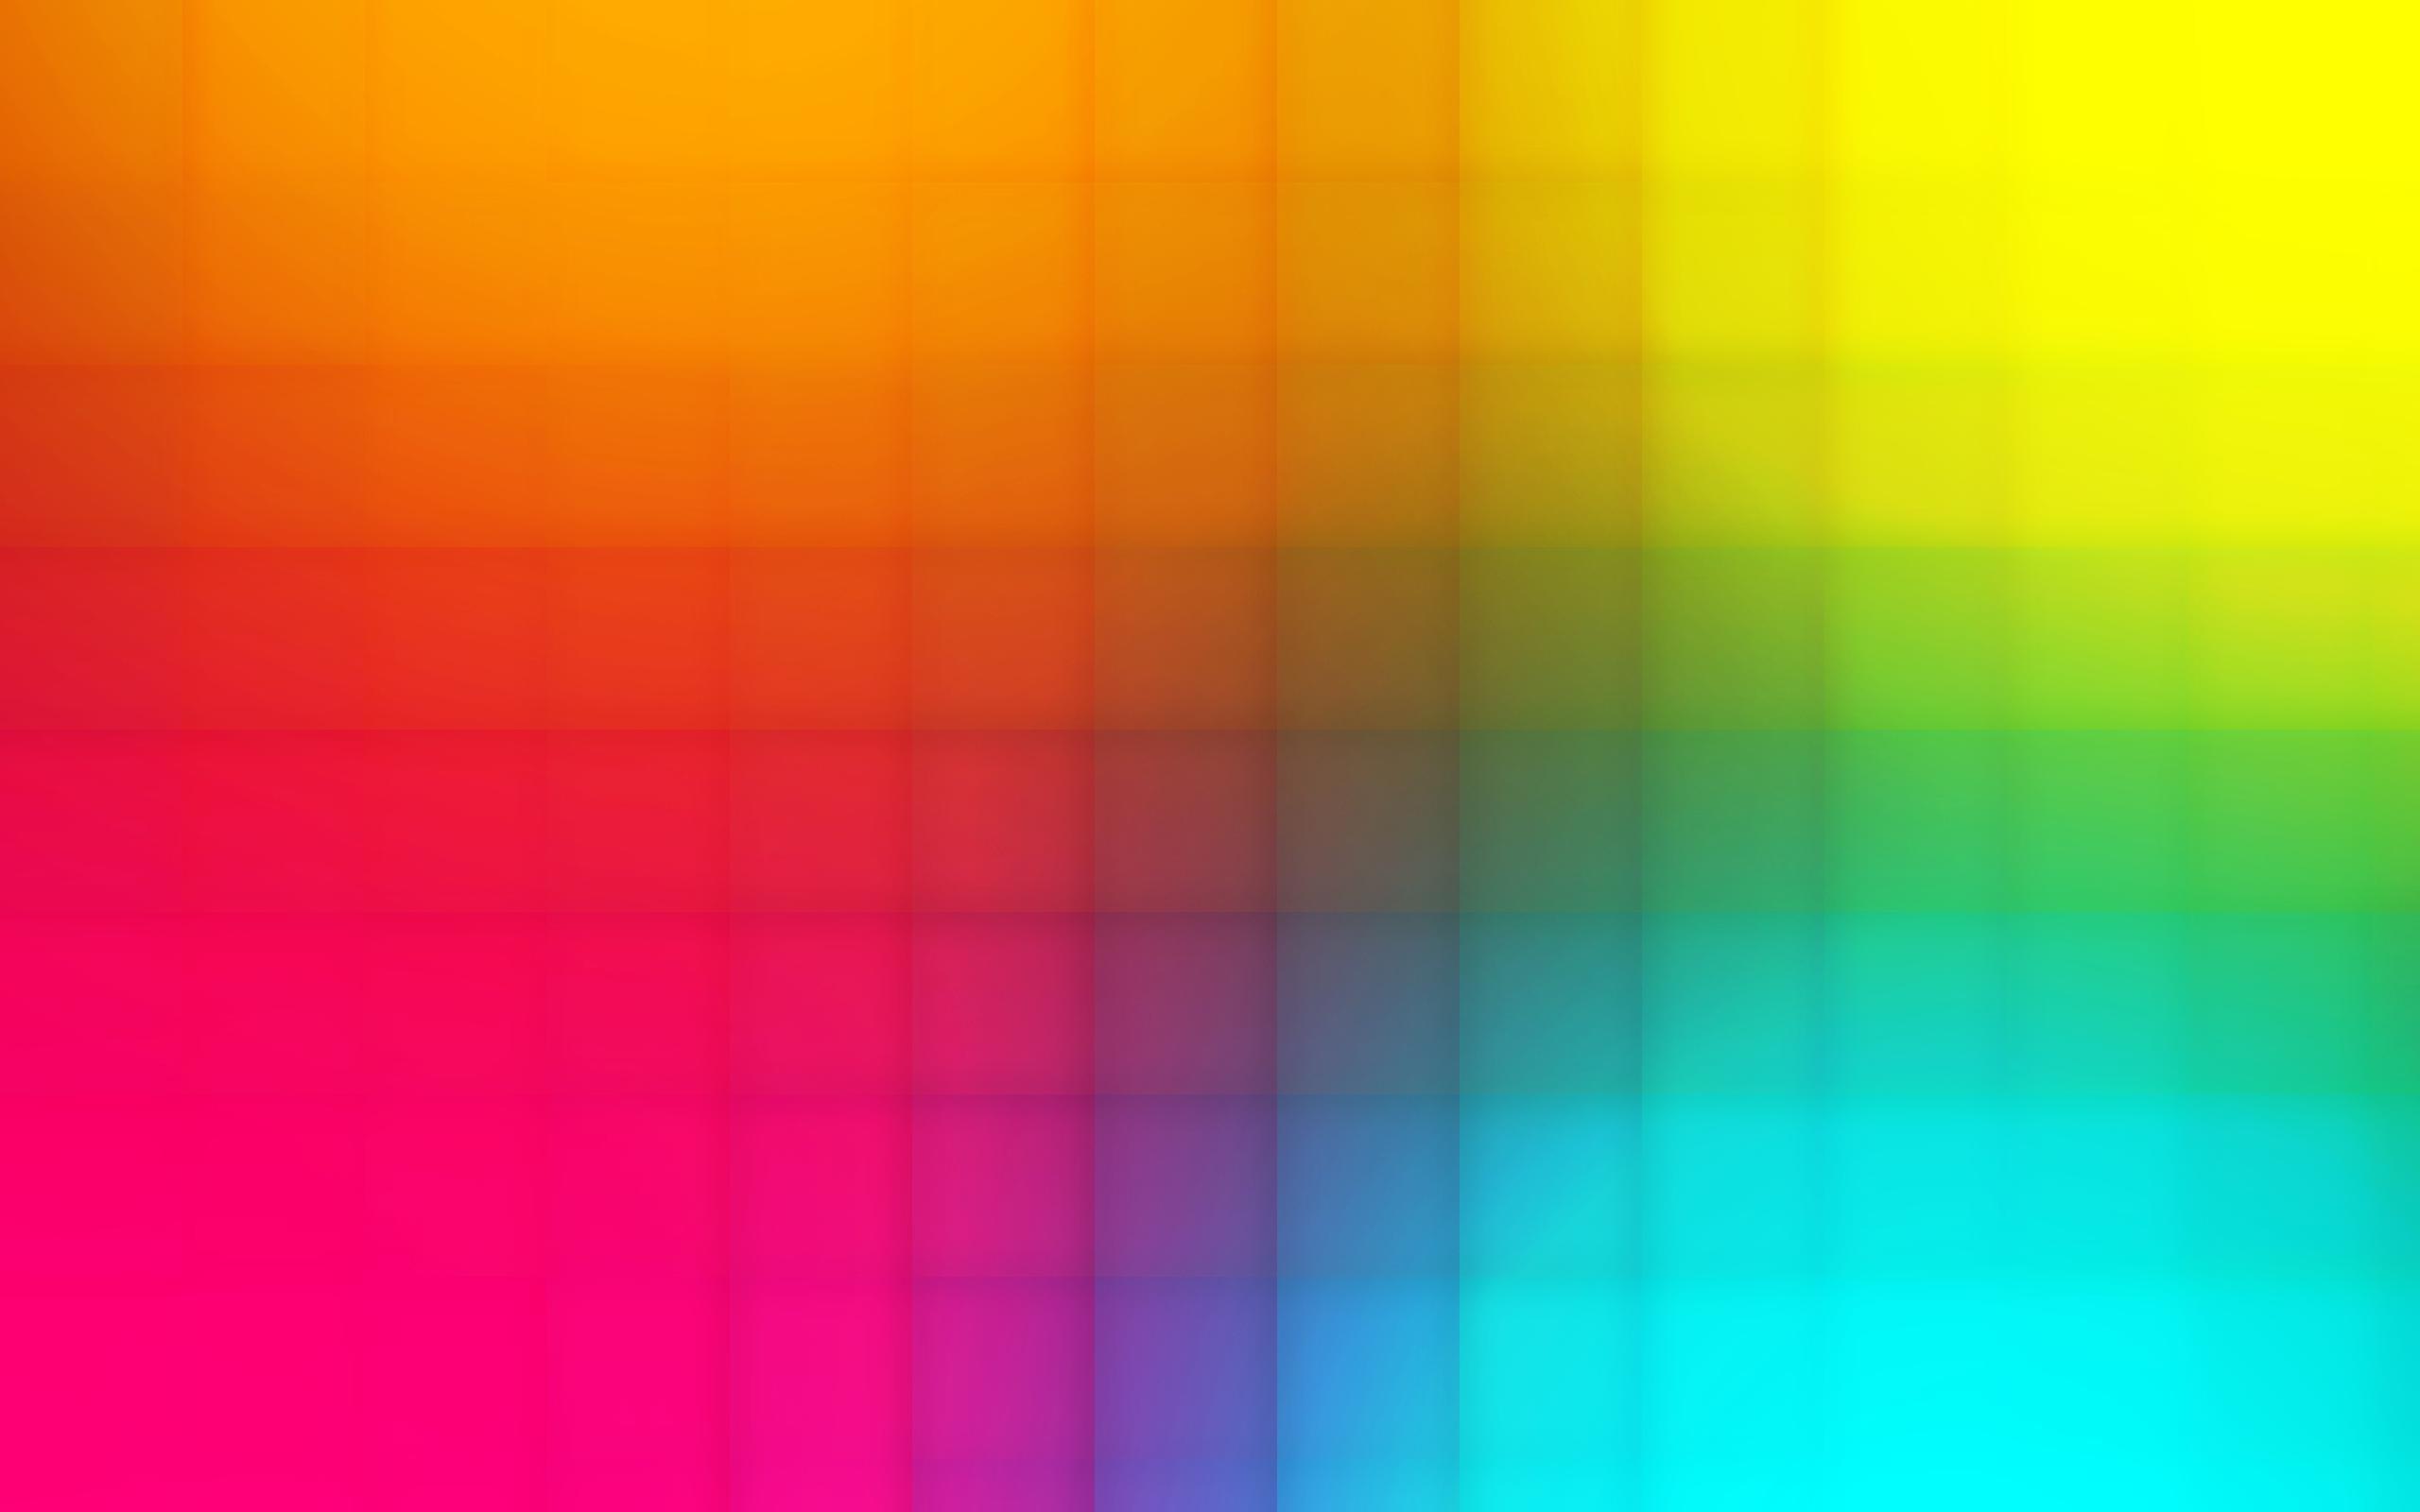 Multicolor Wallpaper - Multi Color Backgrounds Hd - HD Wallpaper